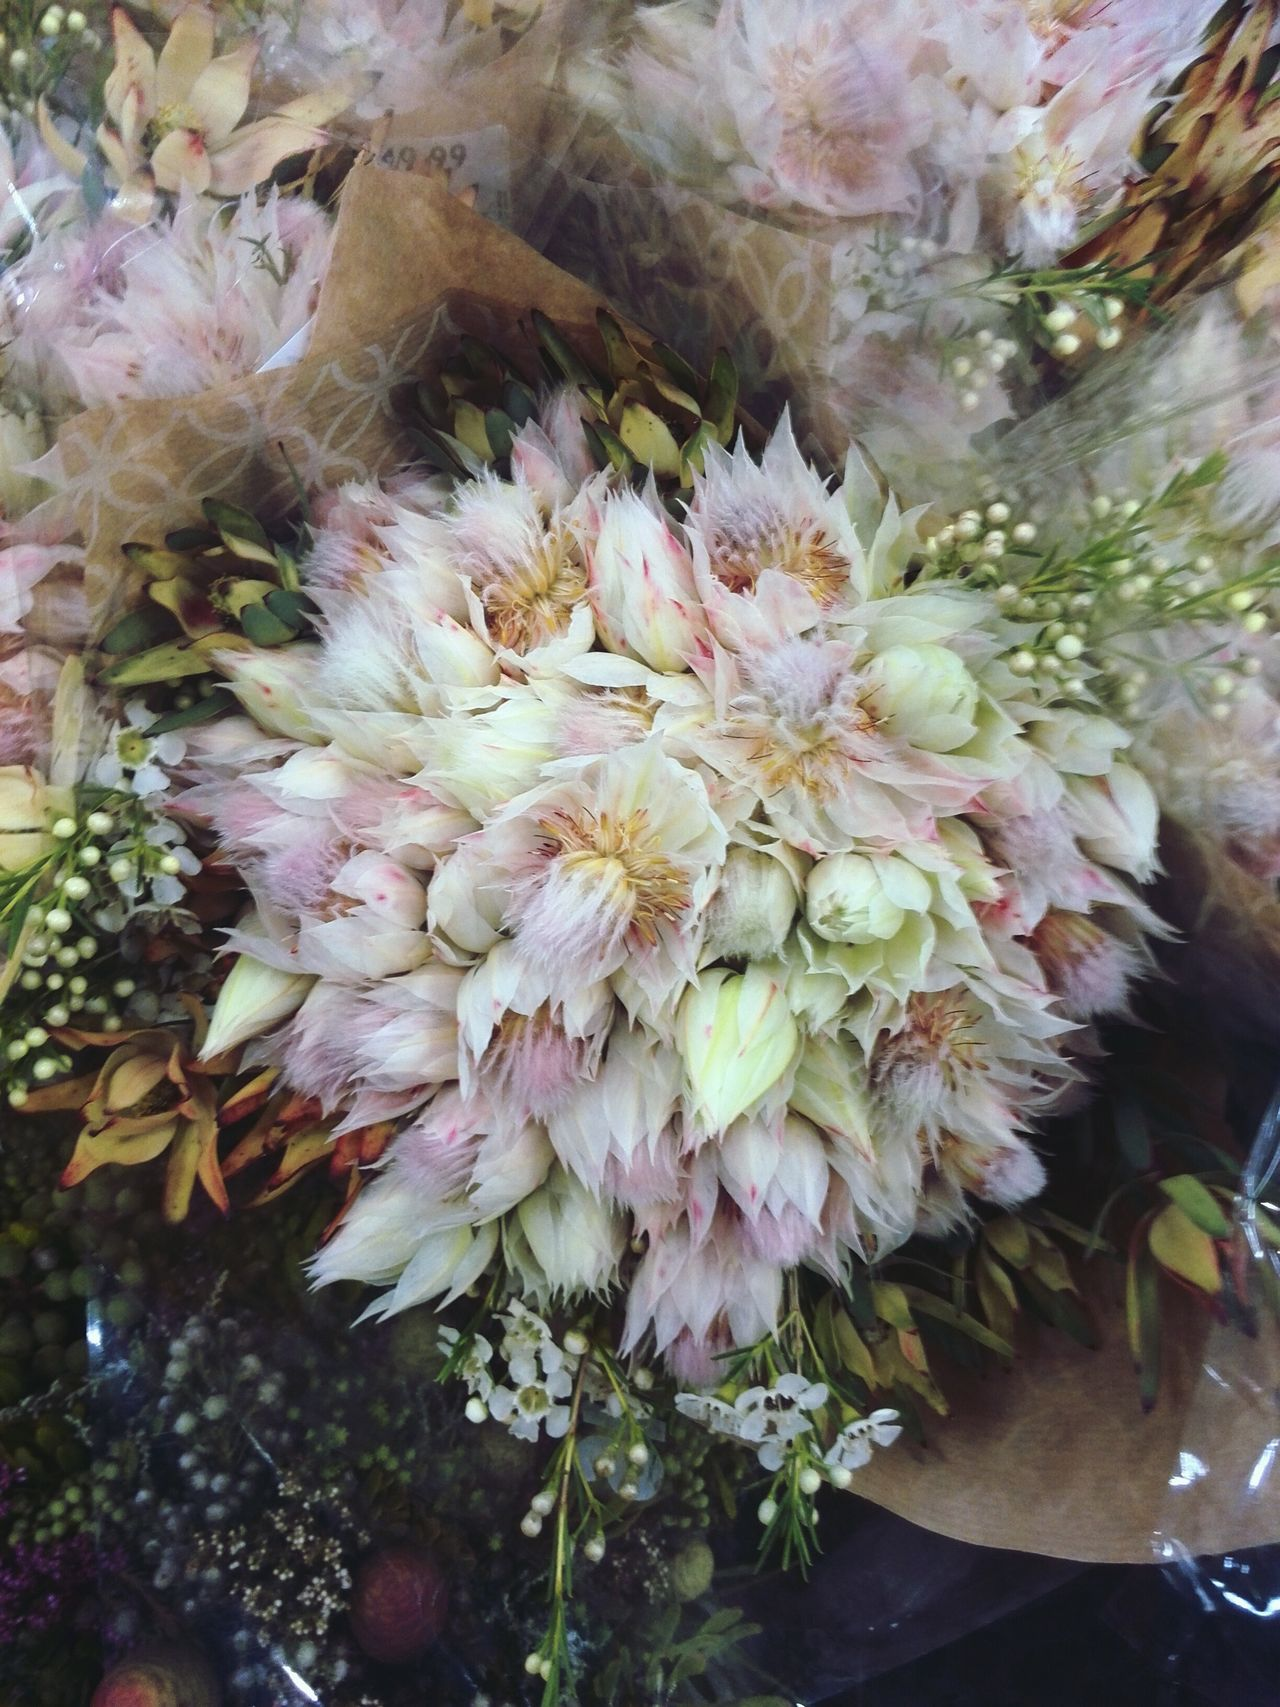 Blushing brides. Flora Southafricanflora Blushingbride Femininity Floral Soft Pastel Power